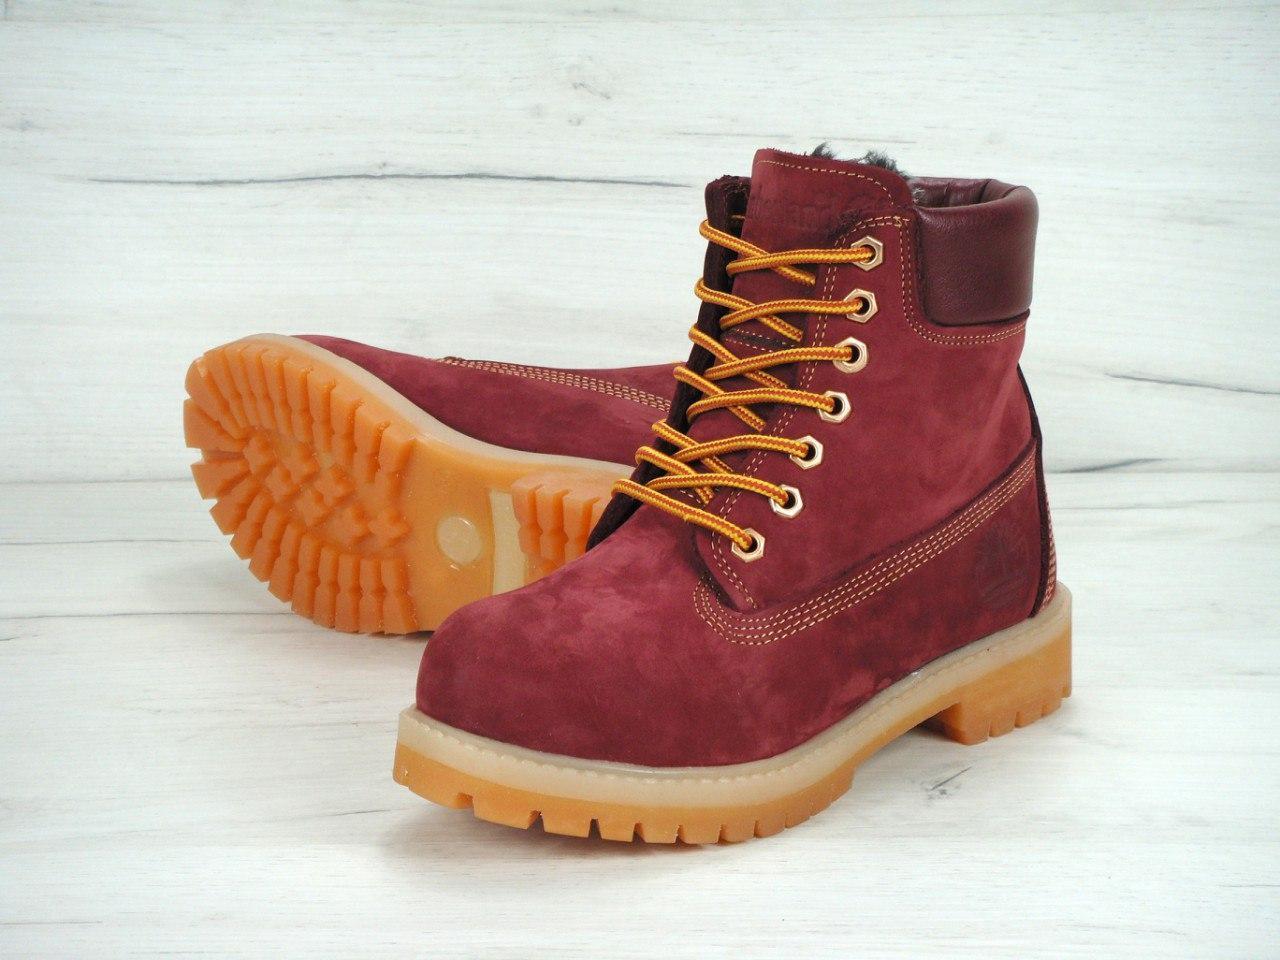 6ad41f60250c0f Женские зимние ботинки Timberland bordo с мехом (Реплика ААА+) - Интернет  супермаркет -